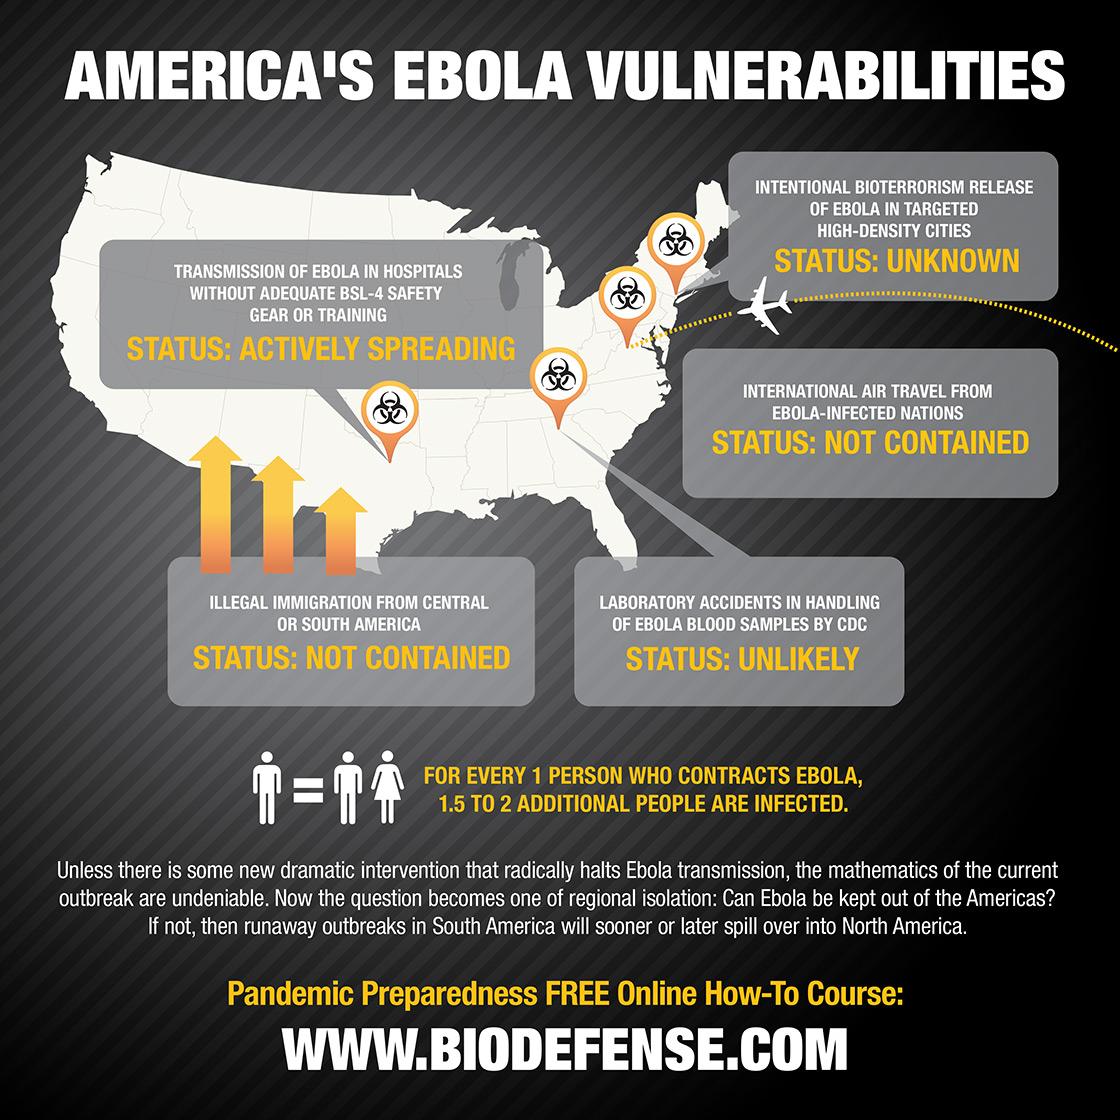 America's Ebola Vulnerabilities